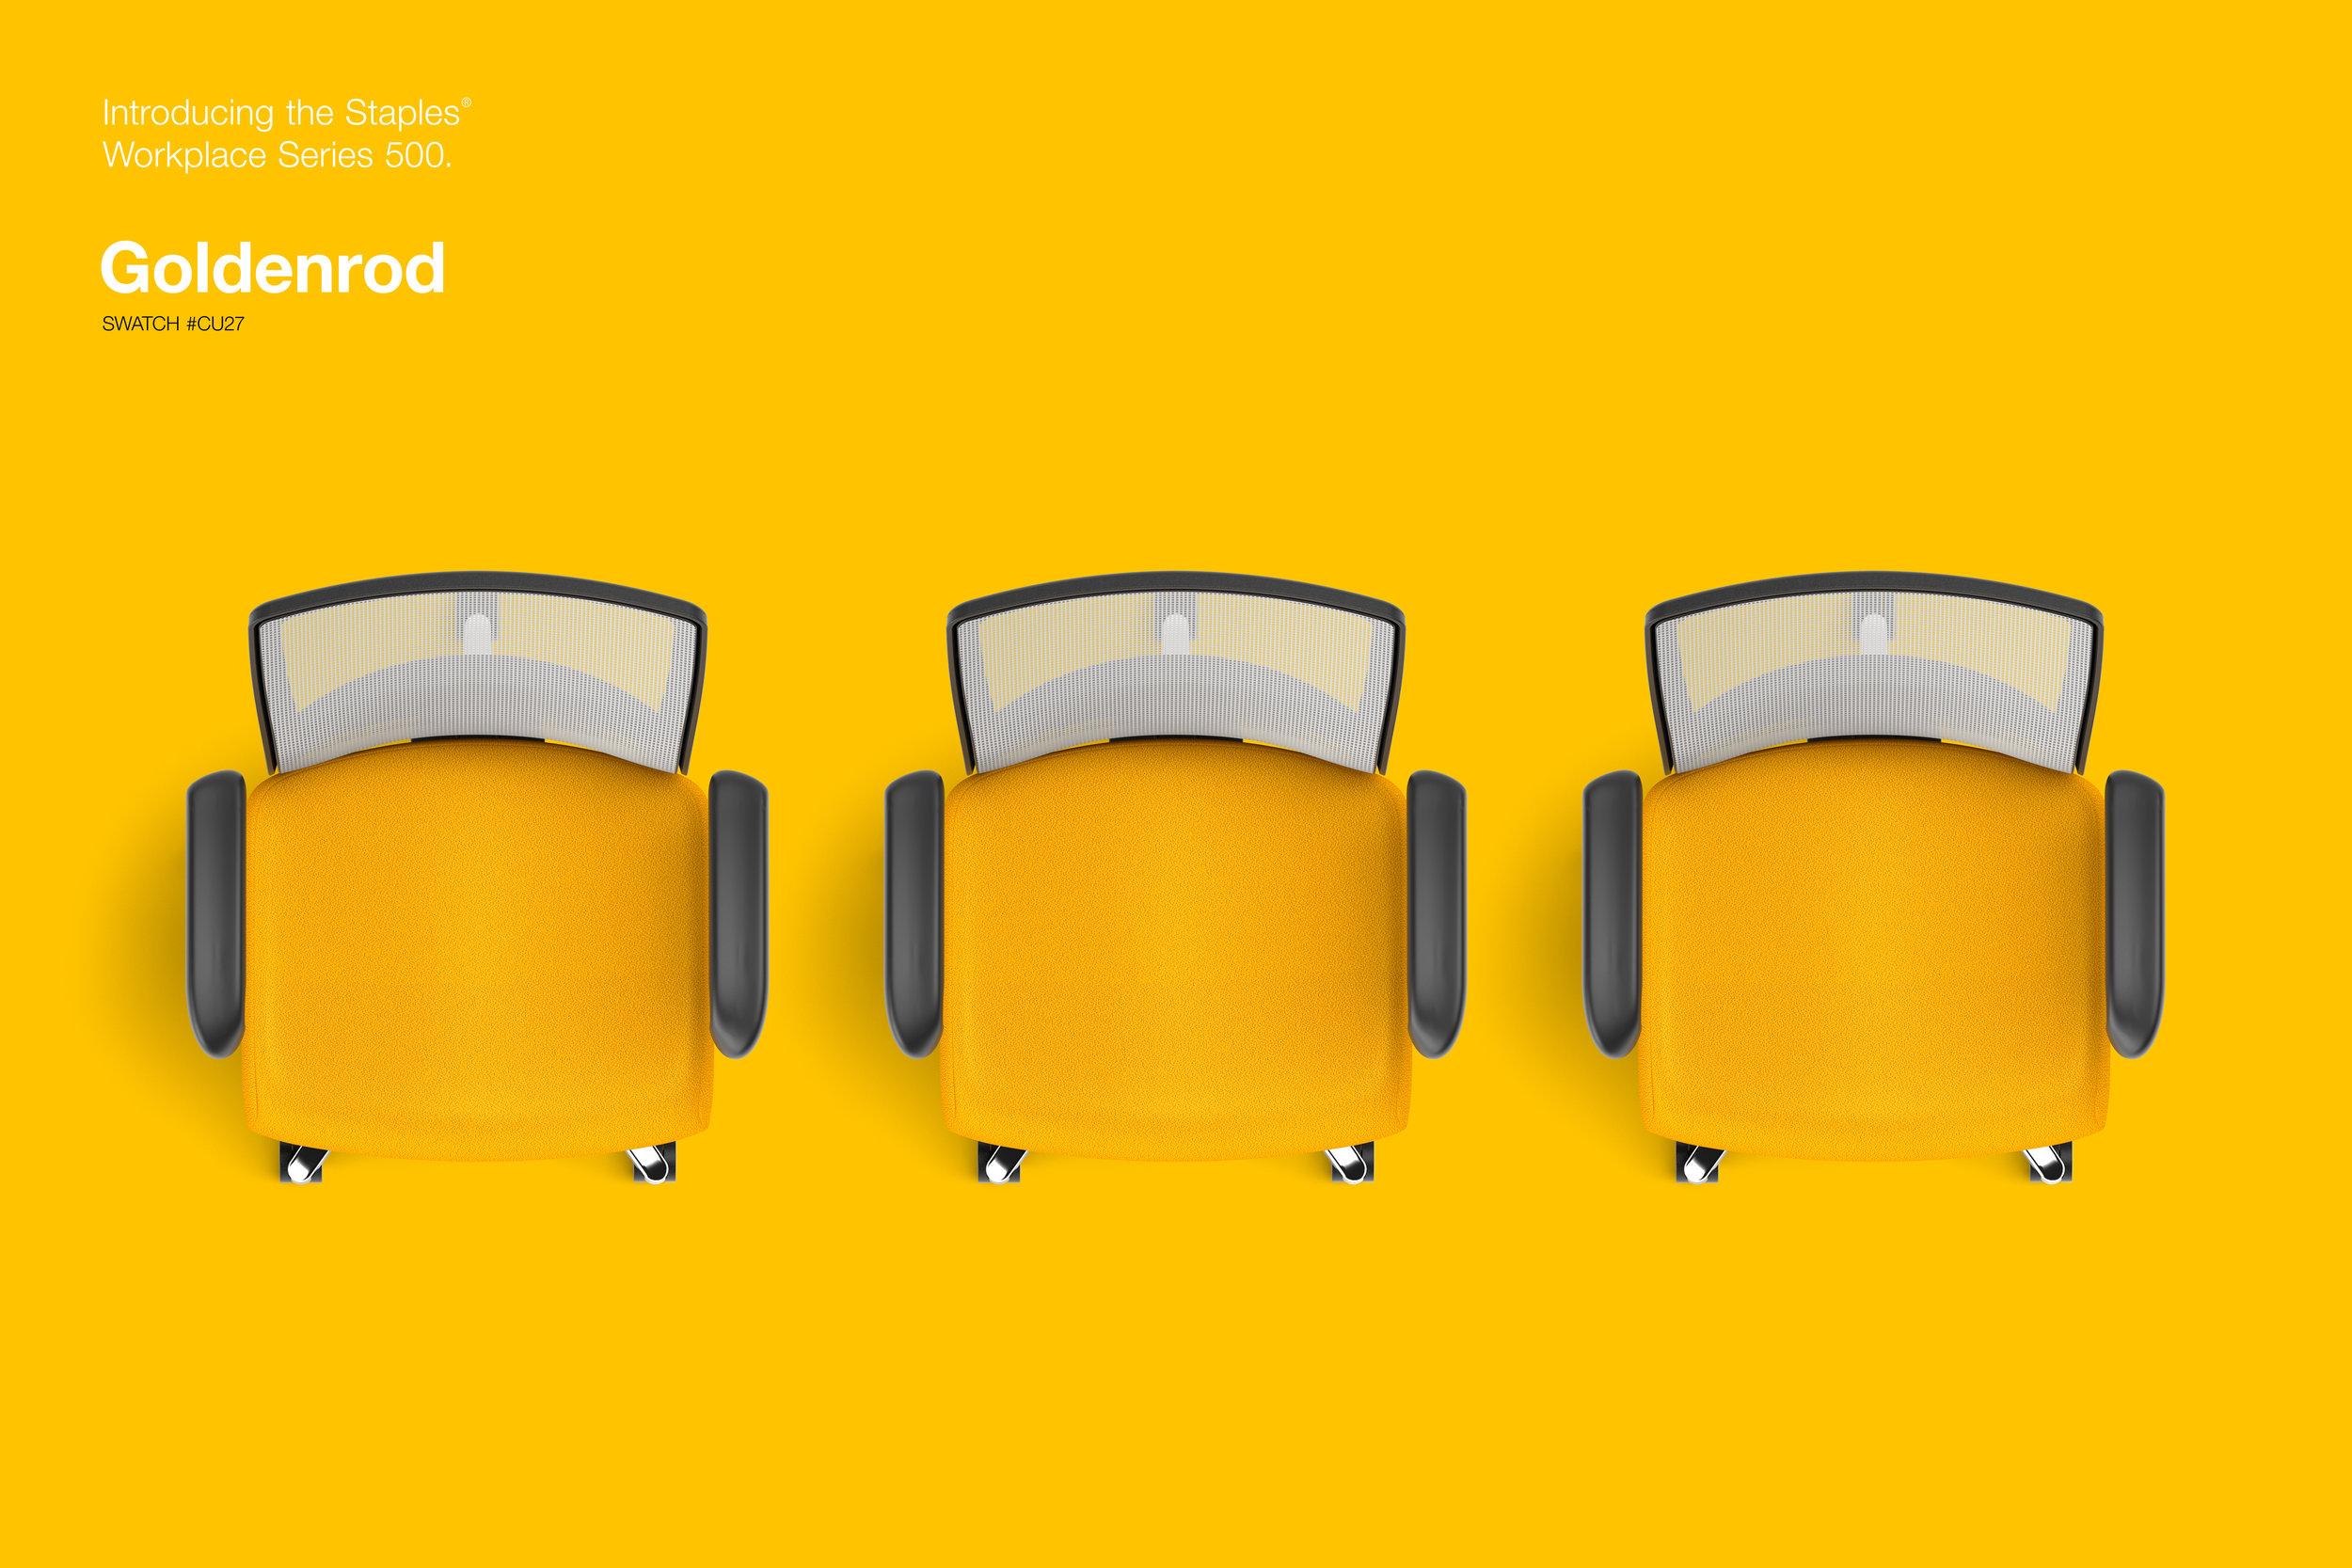 01_Staples-Workplace-Series-Task-Chair-Goldenrod.jpg